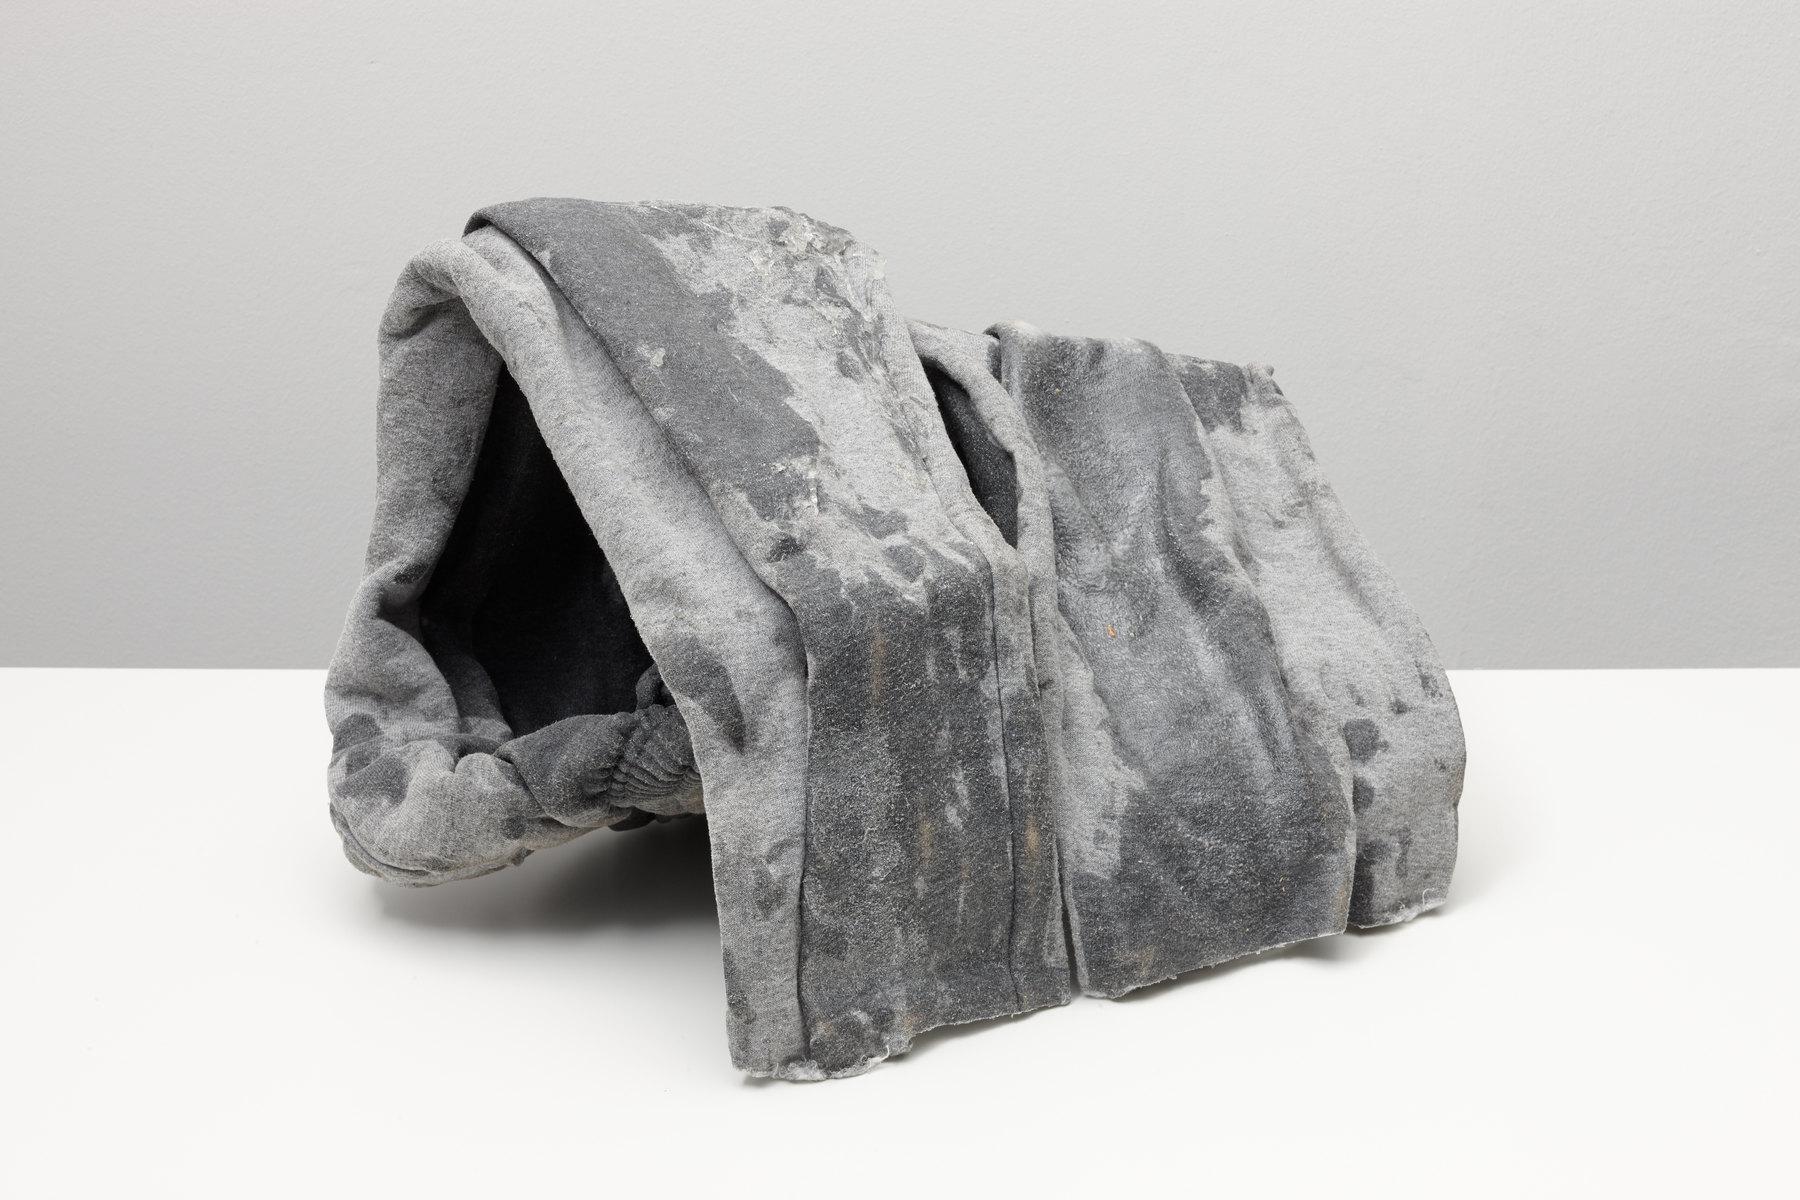 Michael E Smith - Untitled (Sweatpants), 2014